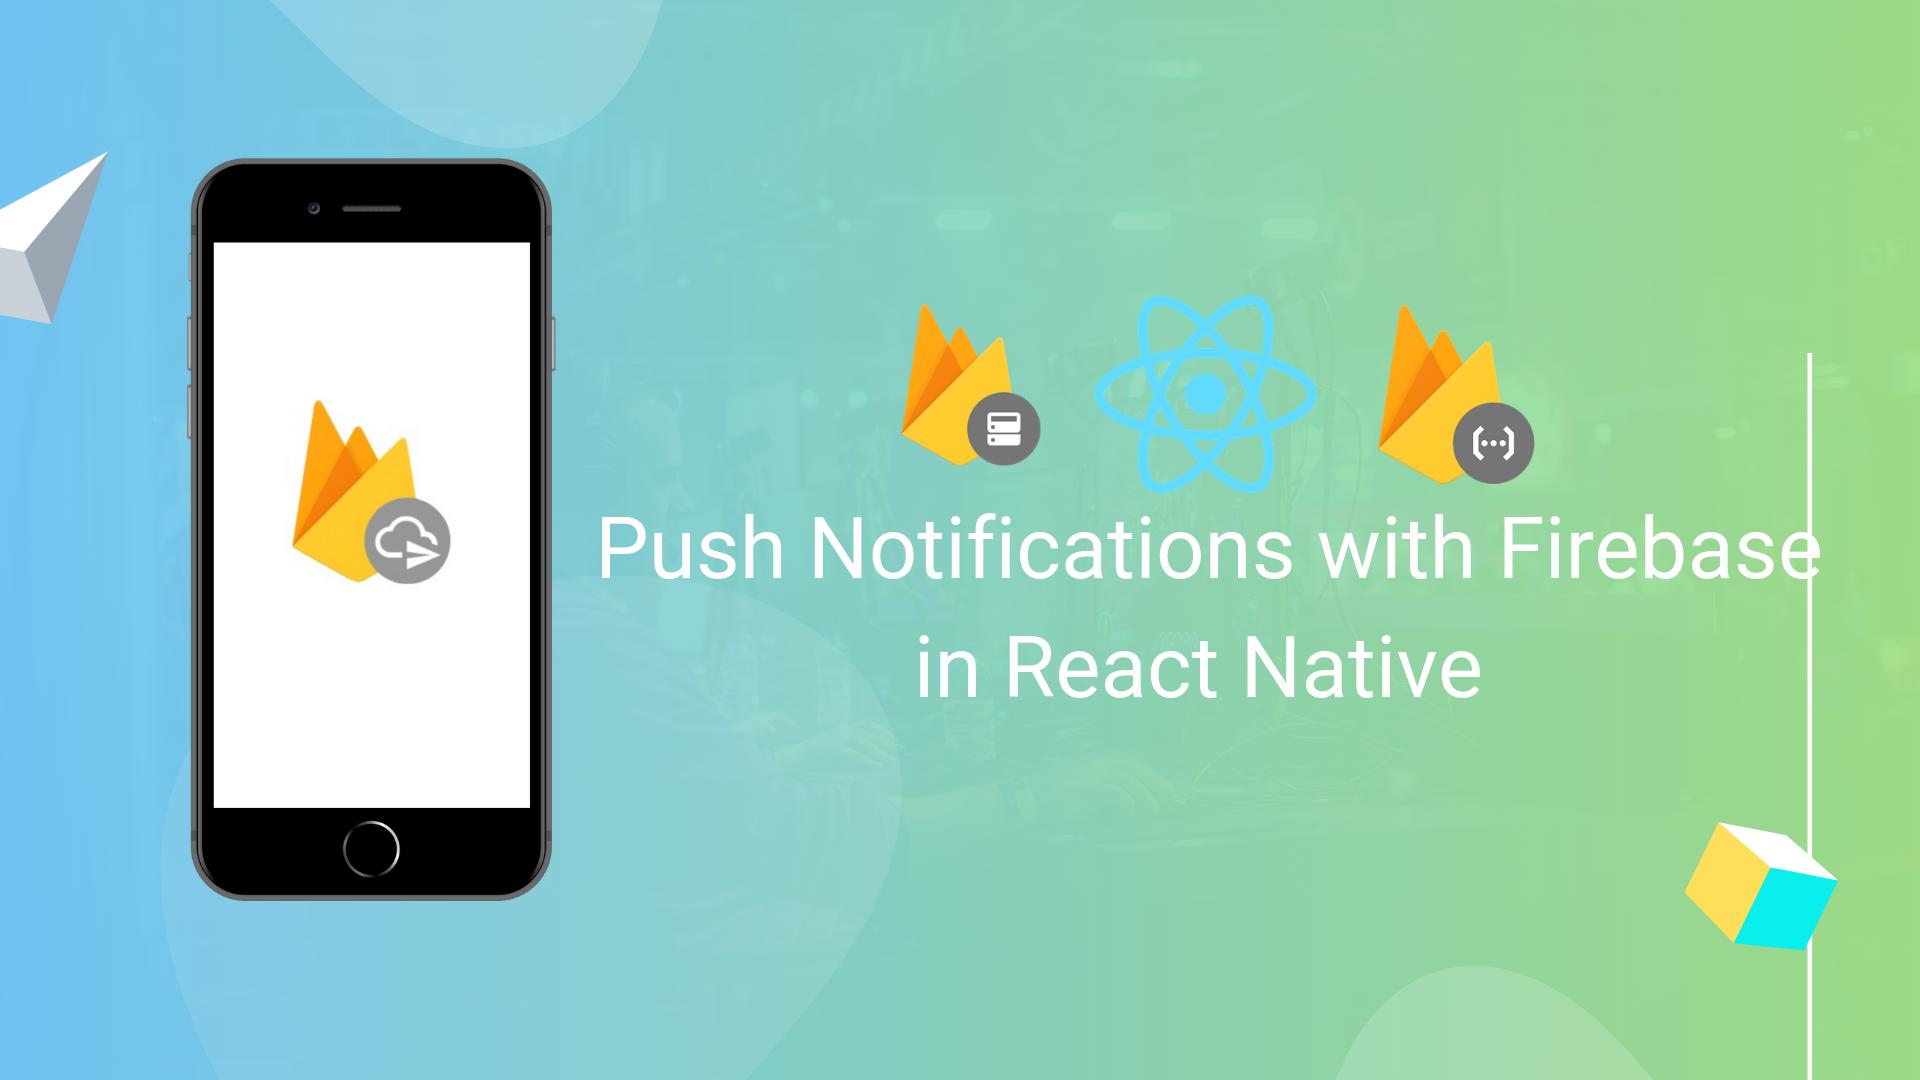 Notifications android emulator push Enable Push